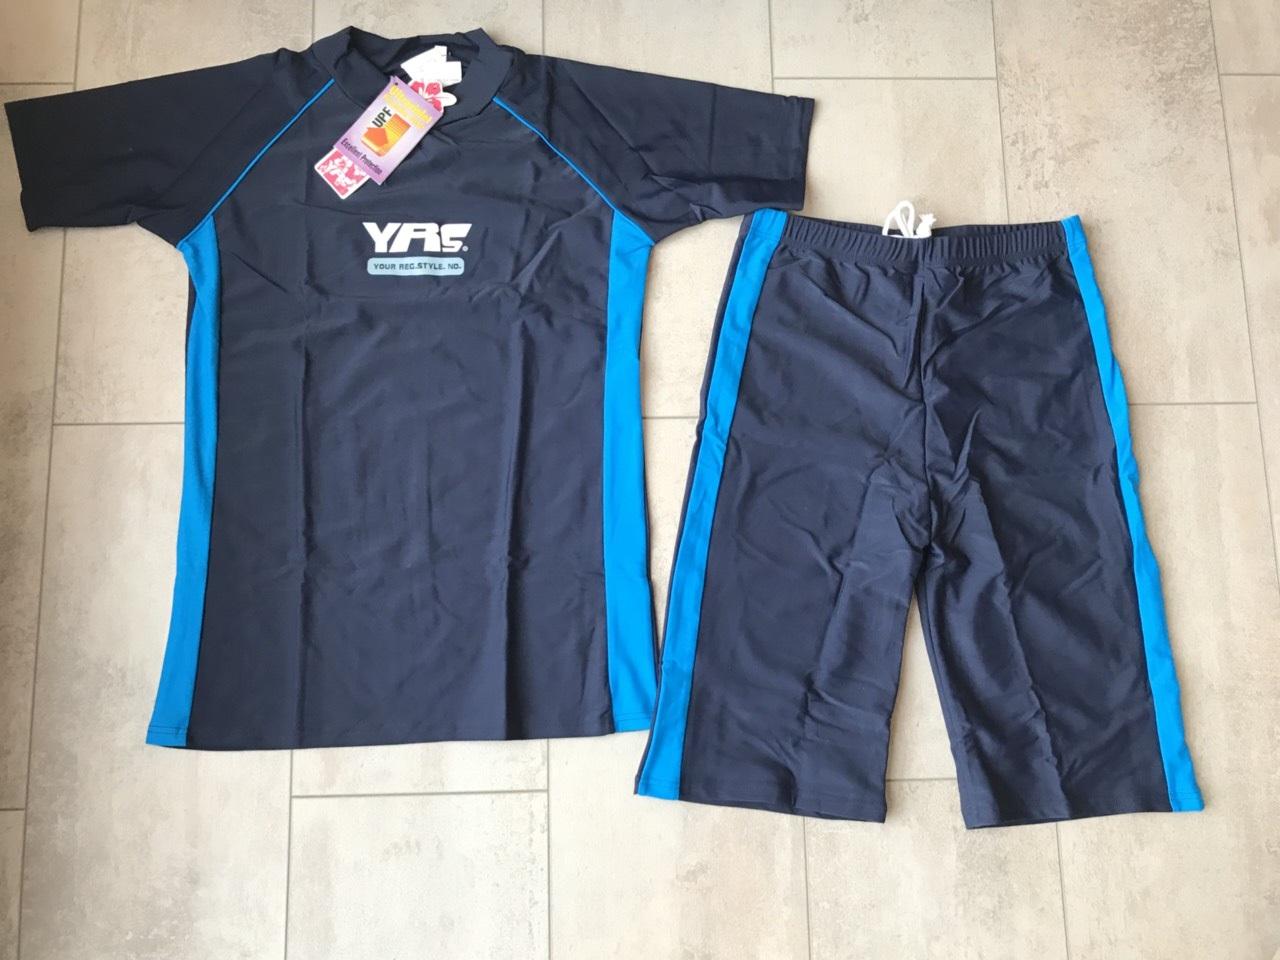 UV- Zwemsetje – Unisex (donkerblauw) Leeftijd 9 -13jr